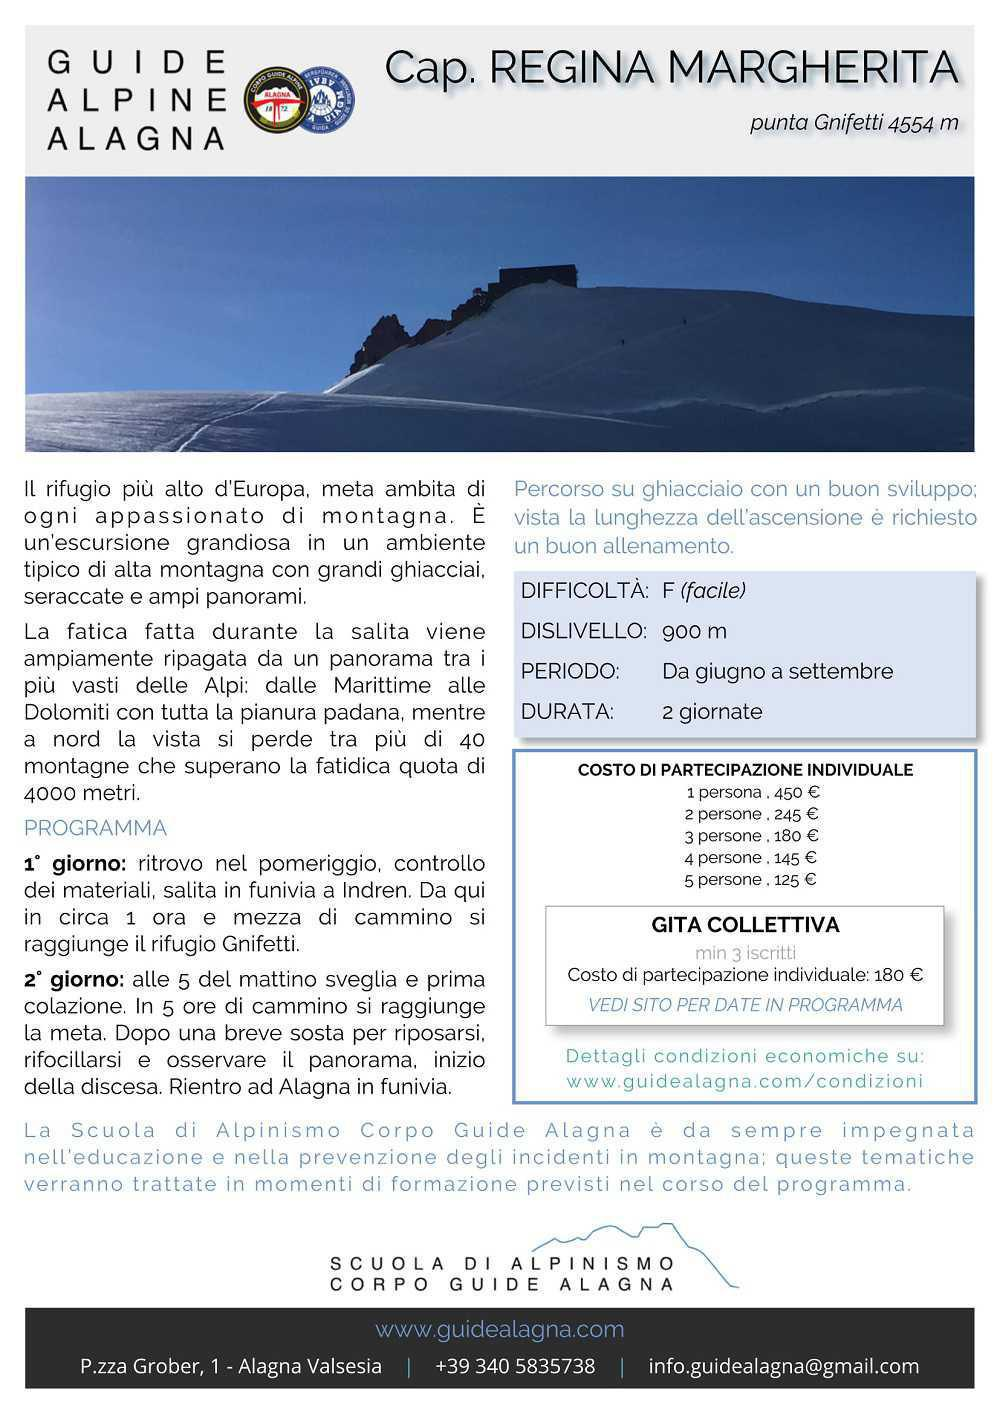 Capanna Regina Margherita - Guide Alpine Alagna